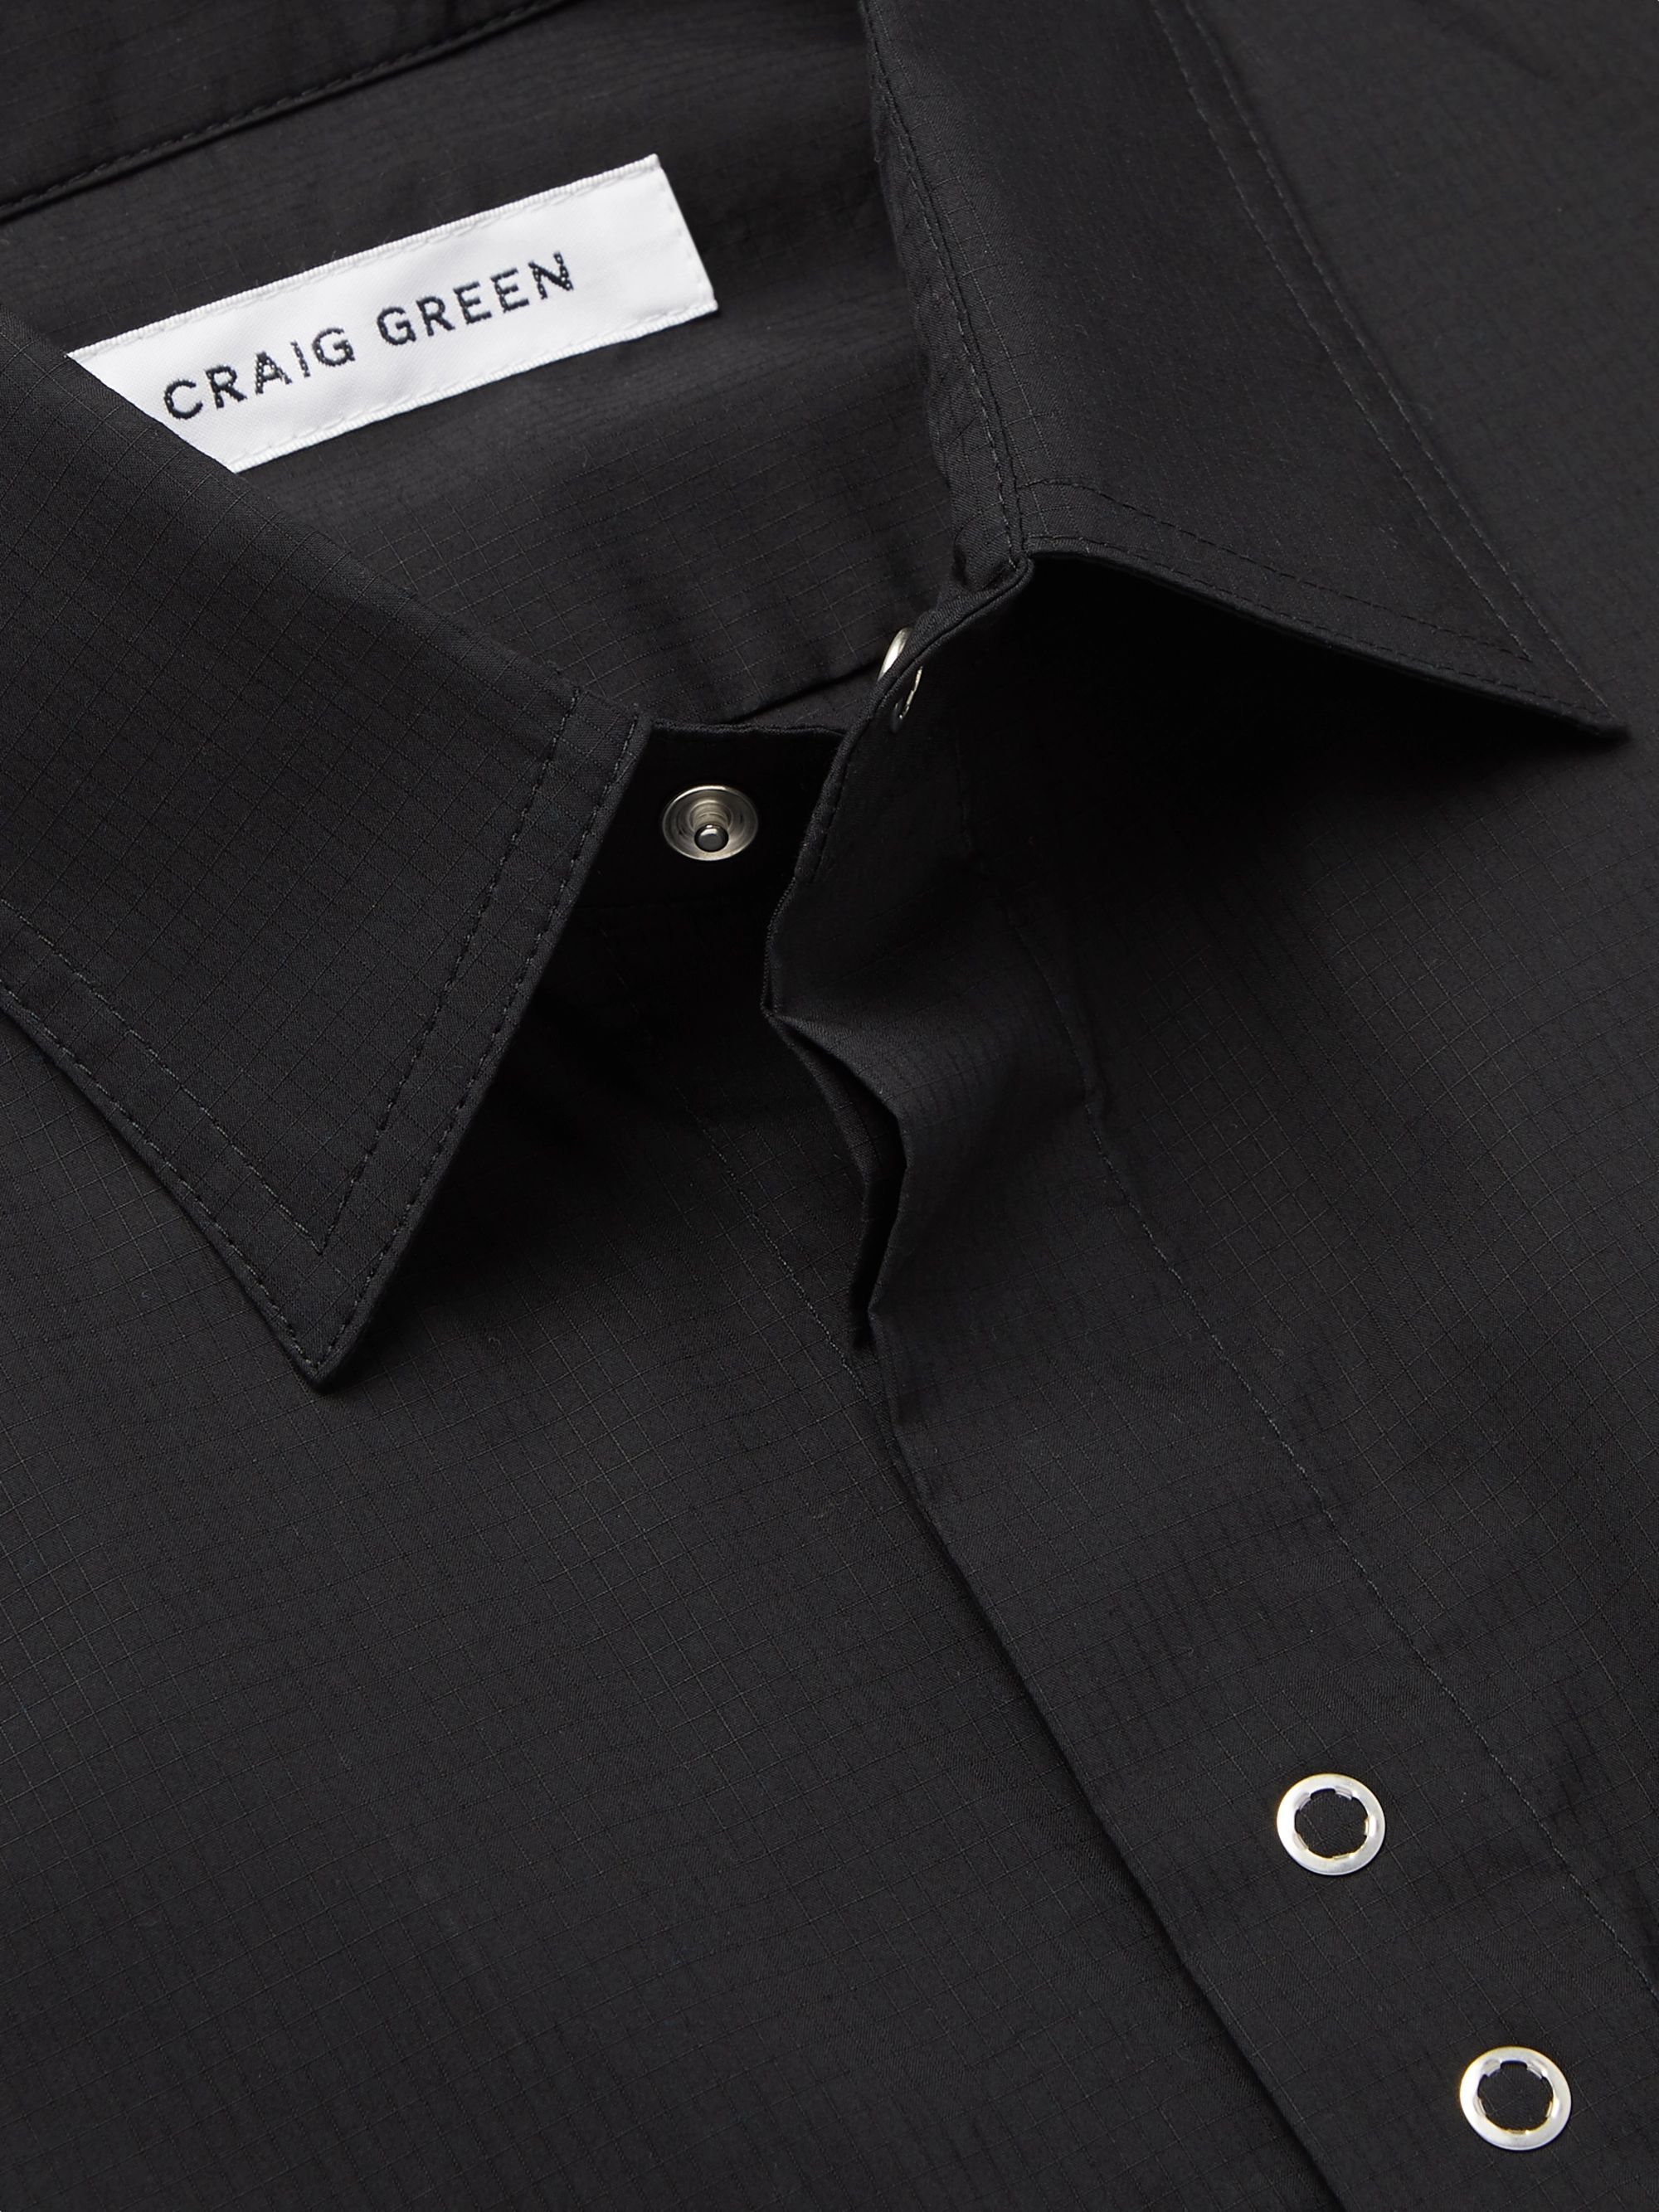 Black Cotton-ripstop Shirt | Craig Green